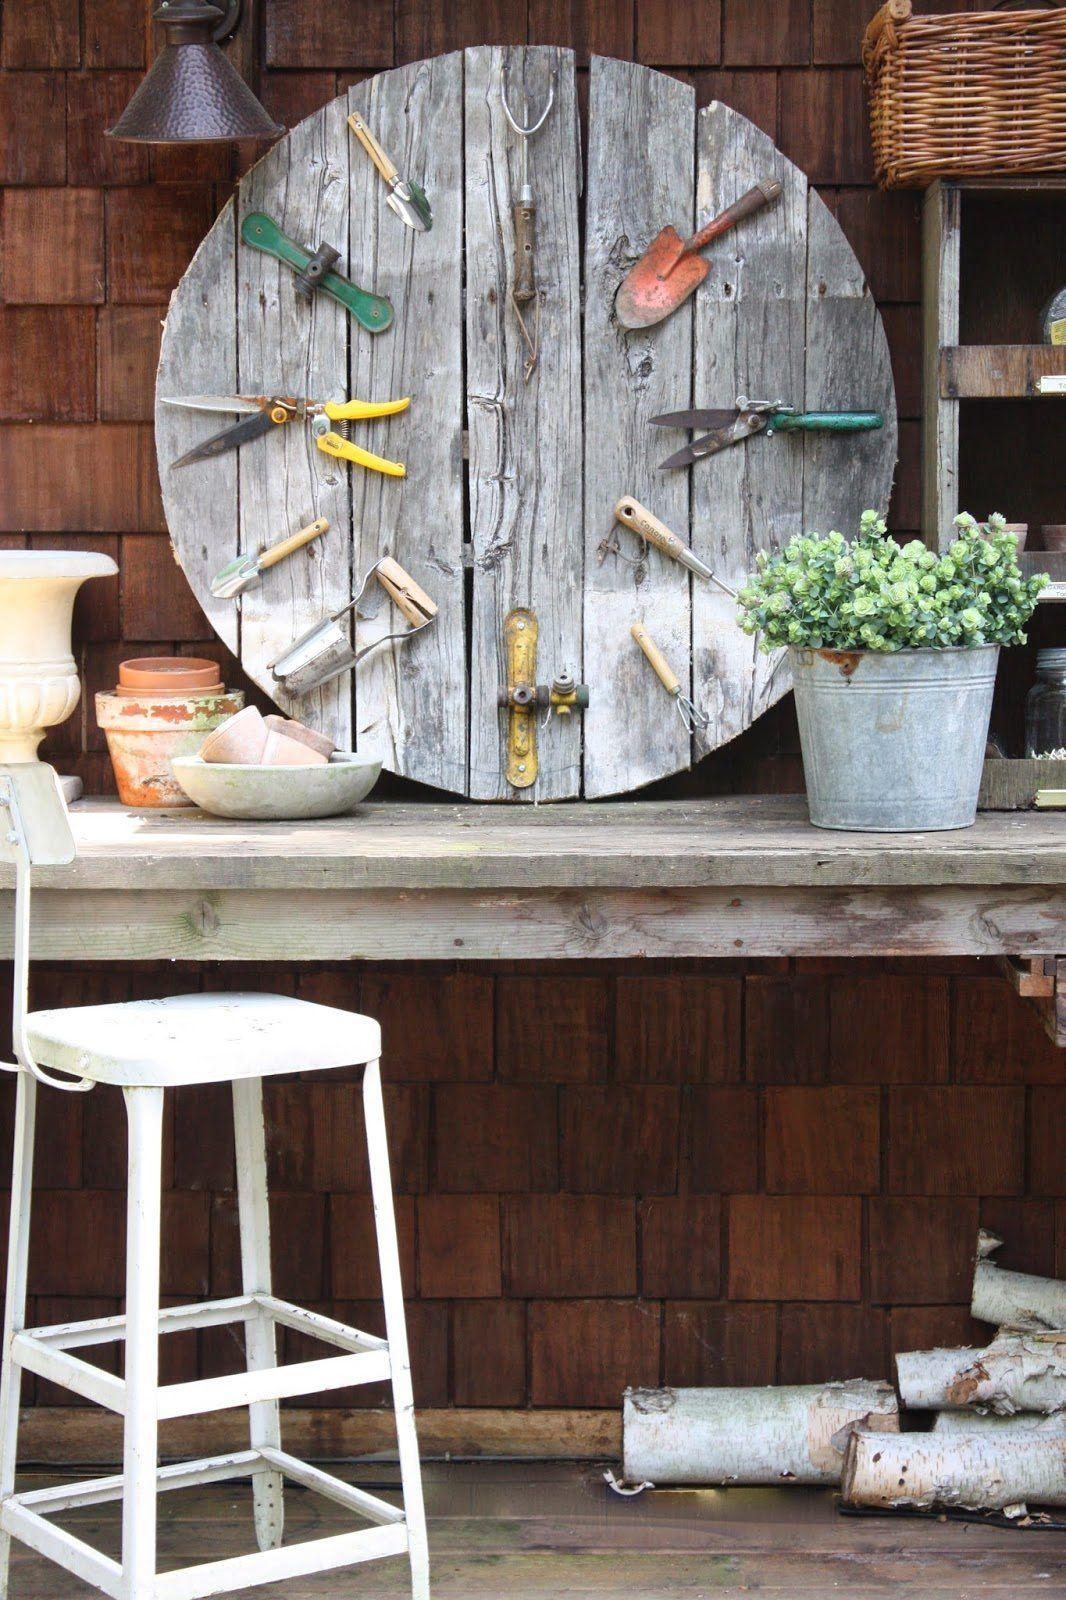 handmade savvy saturday - the handmade home